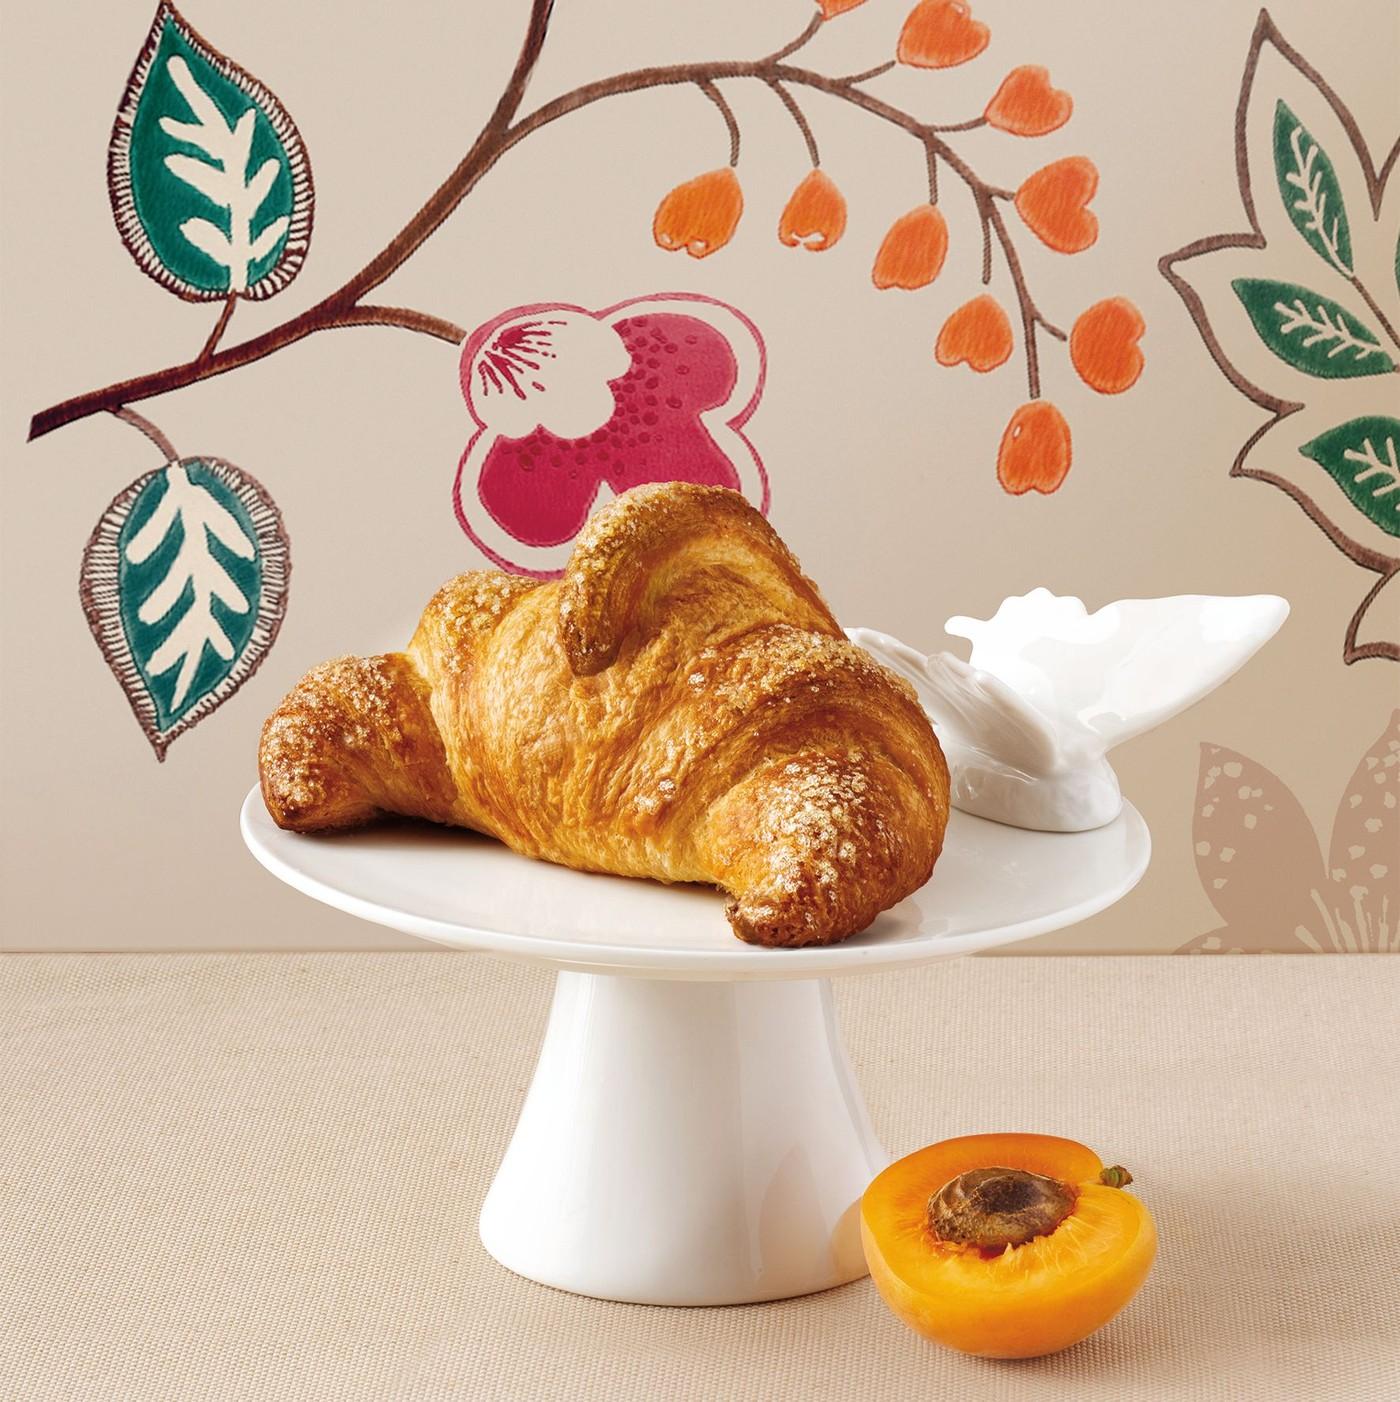 receta de Croissant extra curvo con mermelada de albaricoque